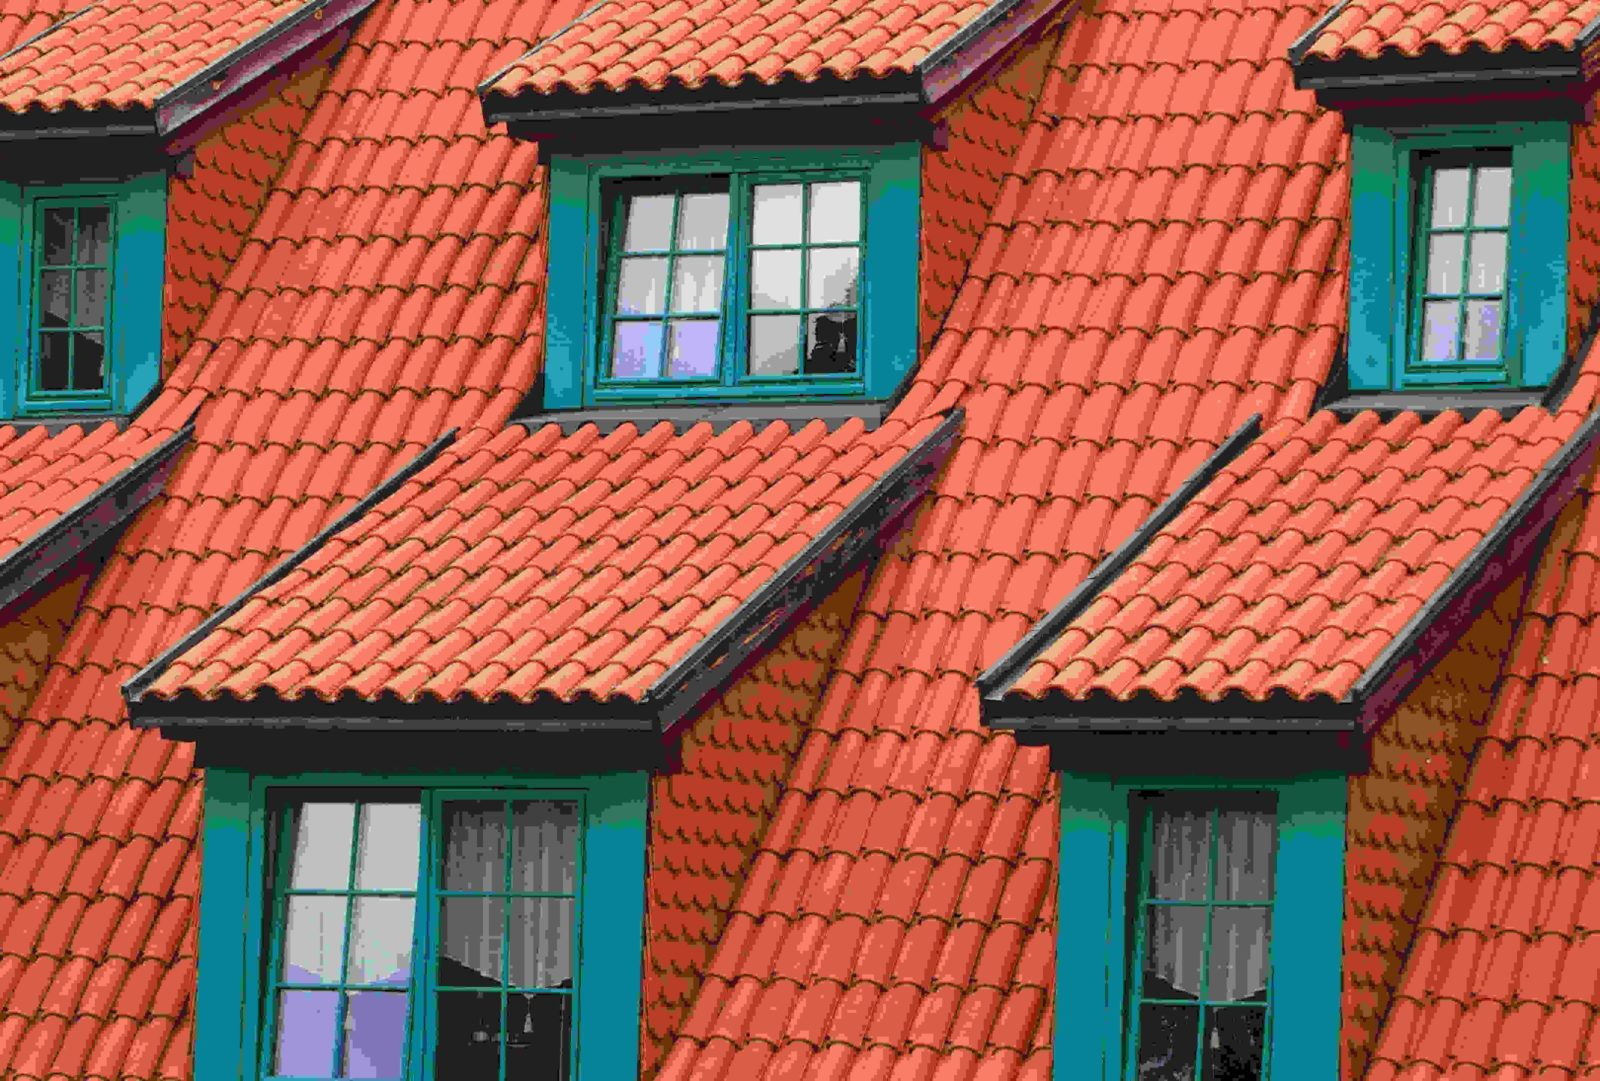 Best Roofing Company Houston